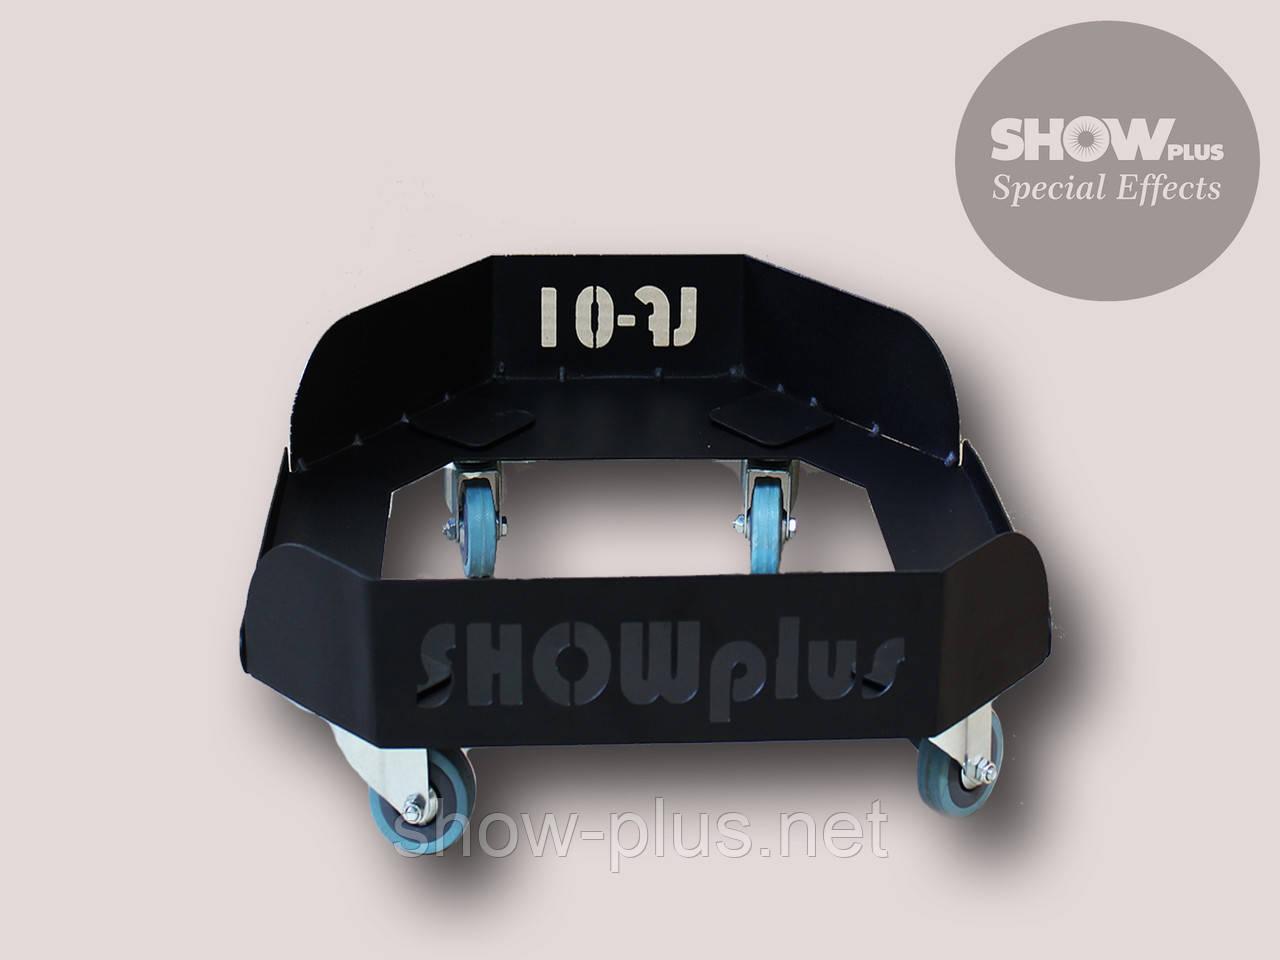 Подставка под генератор тяжелого дыма SHOWplus Mobile Stand